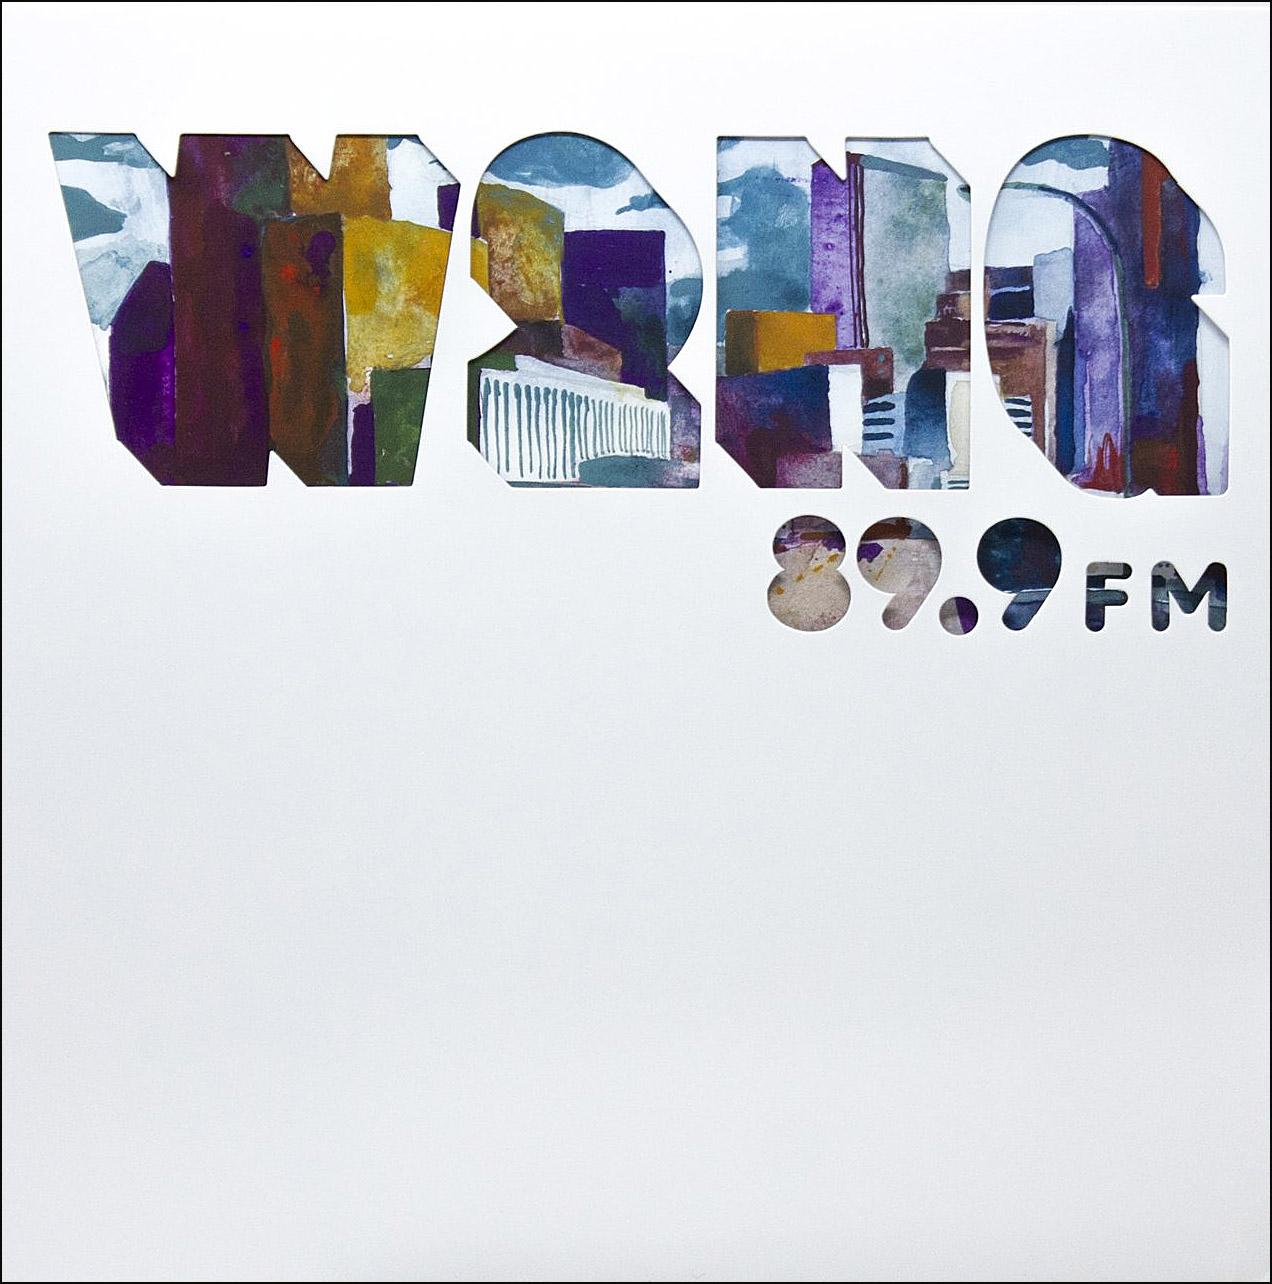 Various - W2NG 89.9 FM  Release Date: April 20, 2018 Label: Numero Group  SERVICE: Restoration, Mastering NUMBER OF DISCS: 1 GENRE: Reggae FORMAT: LP